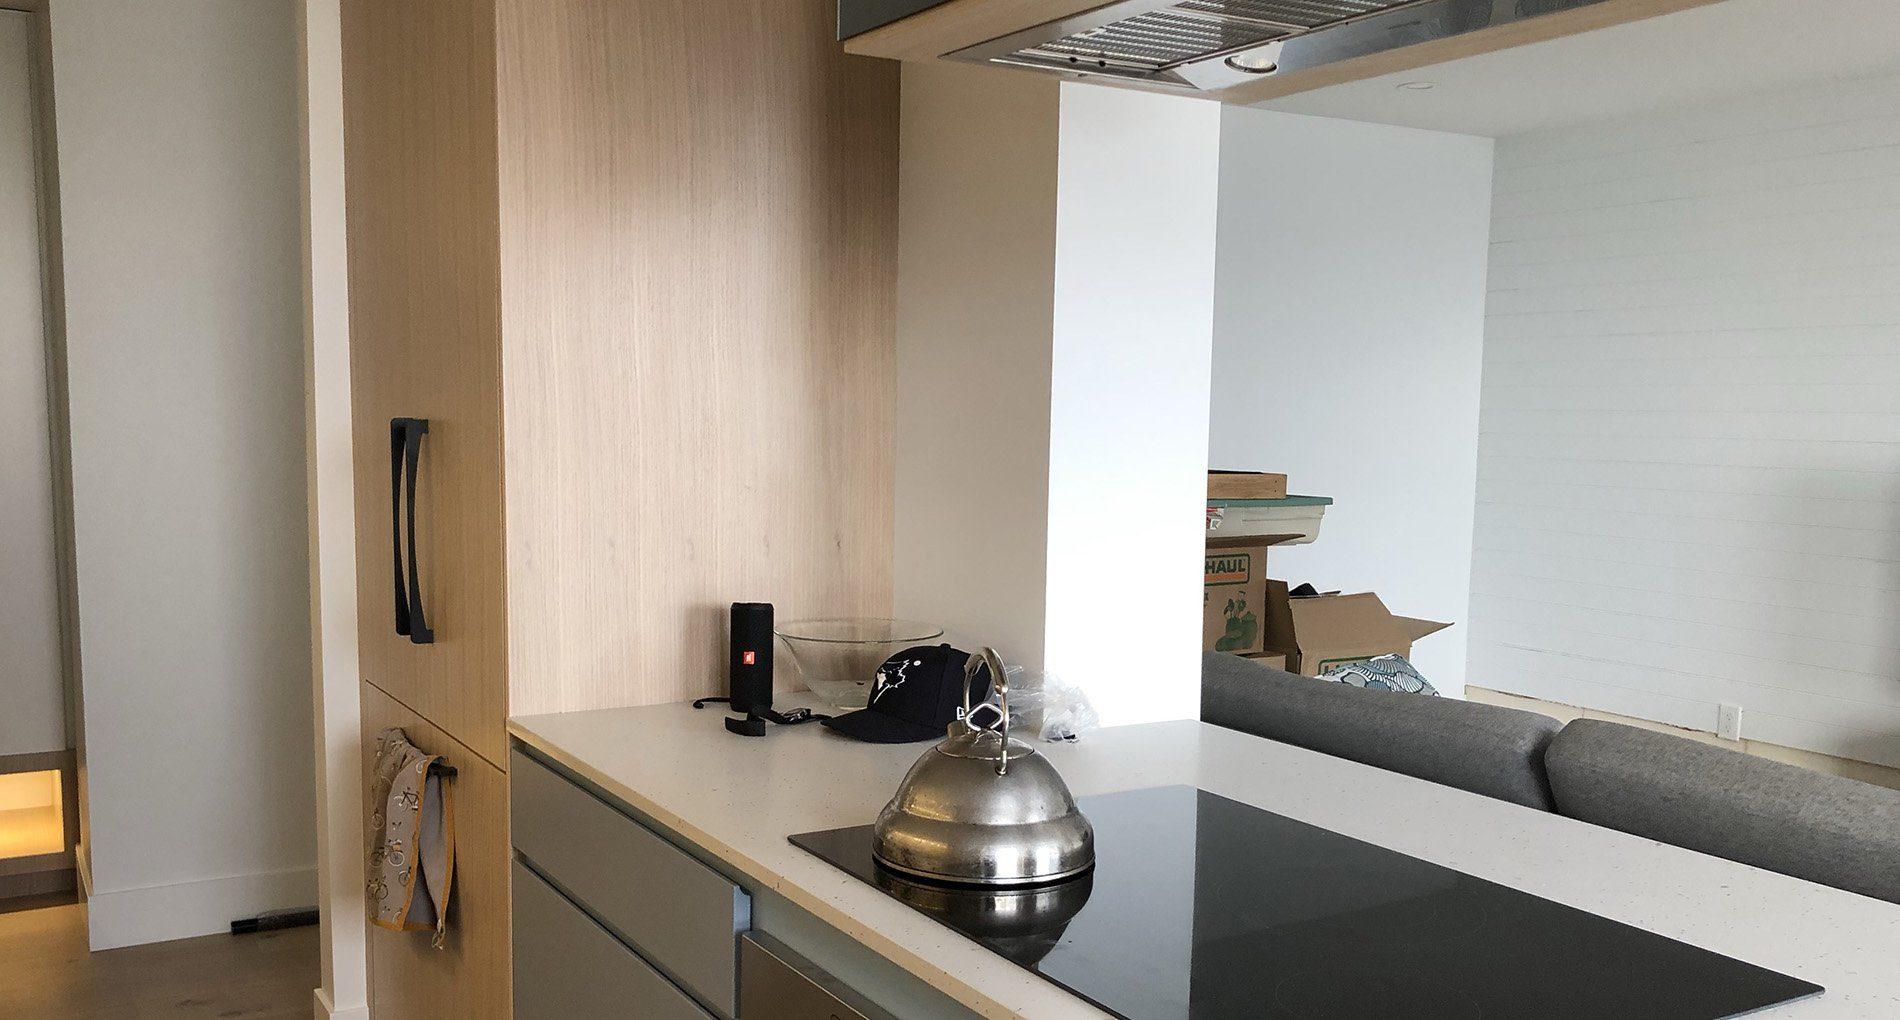 Kitchen Renovation Newwestminster Royalave Slider